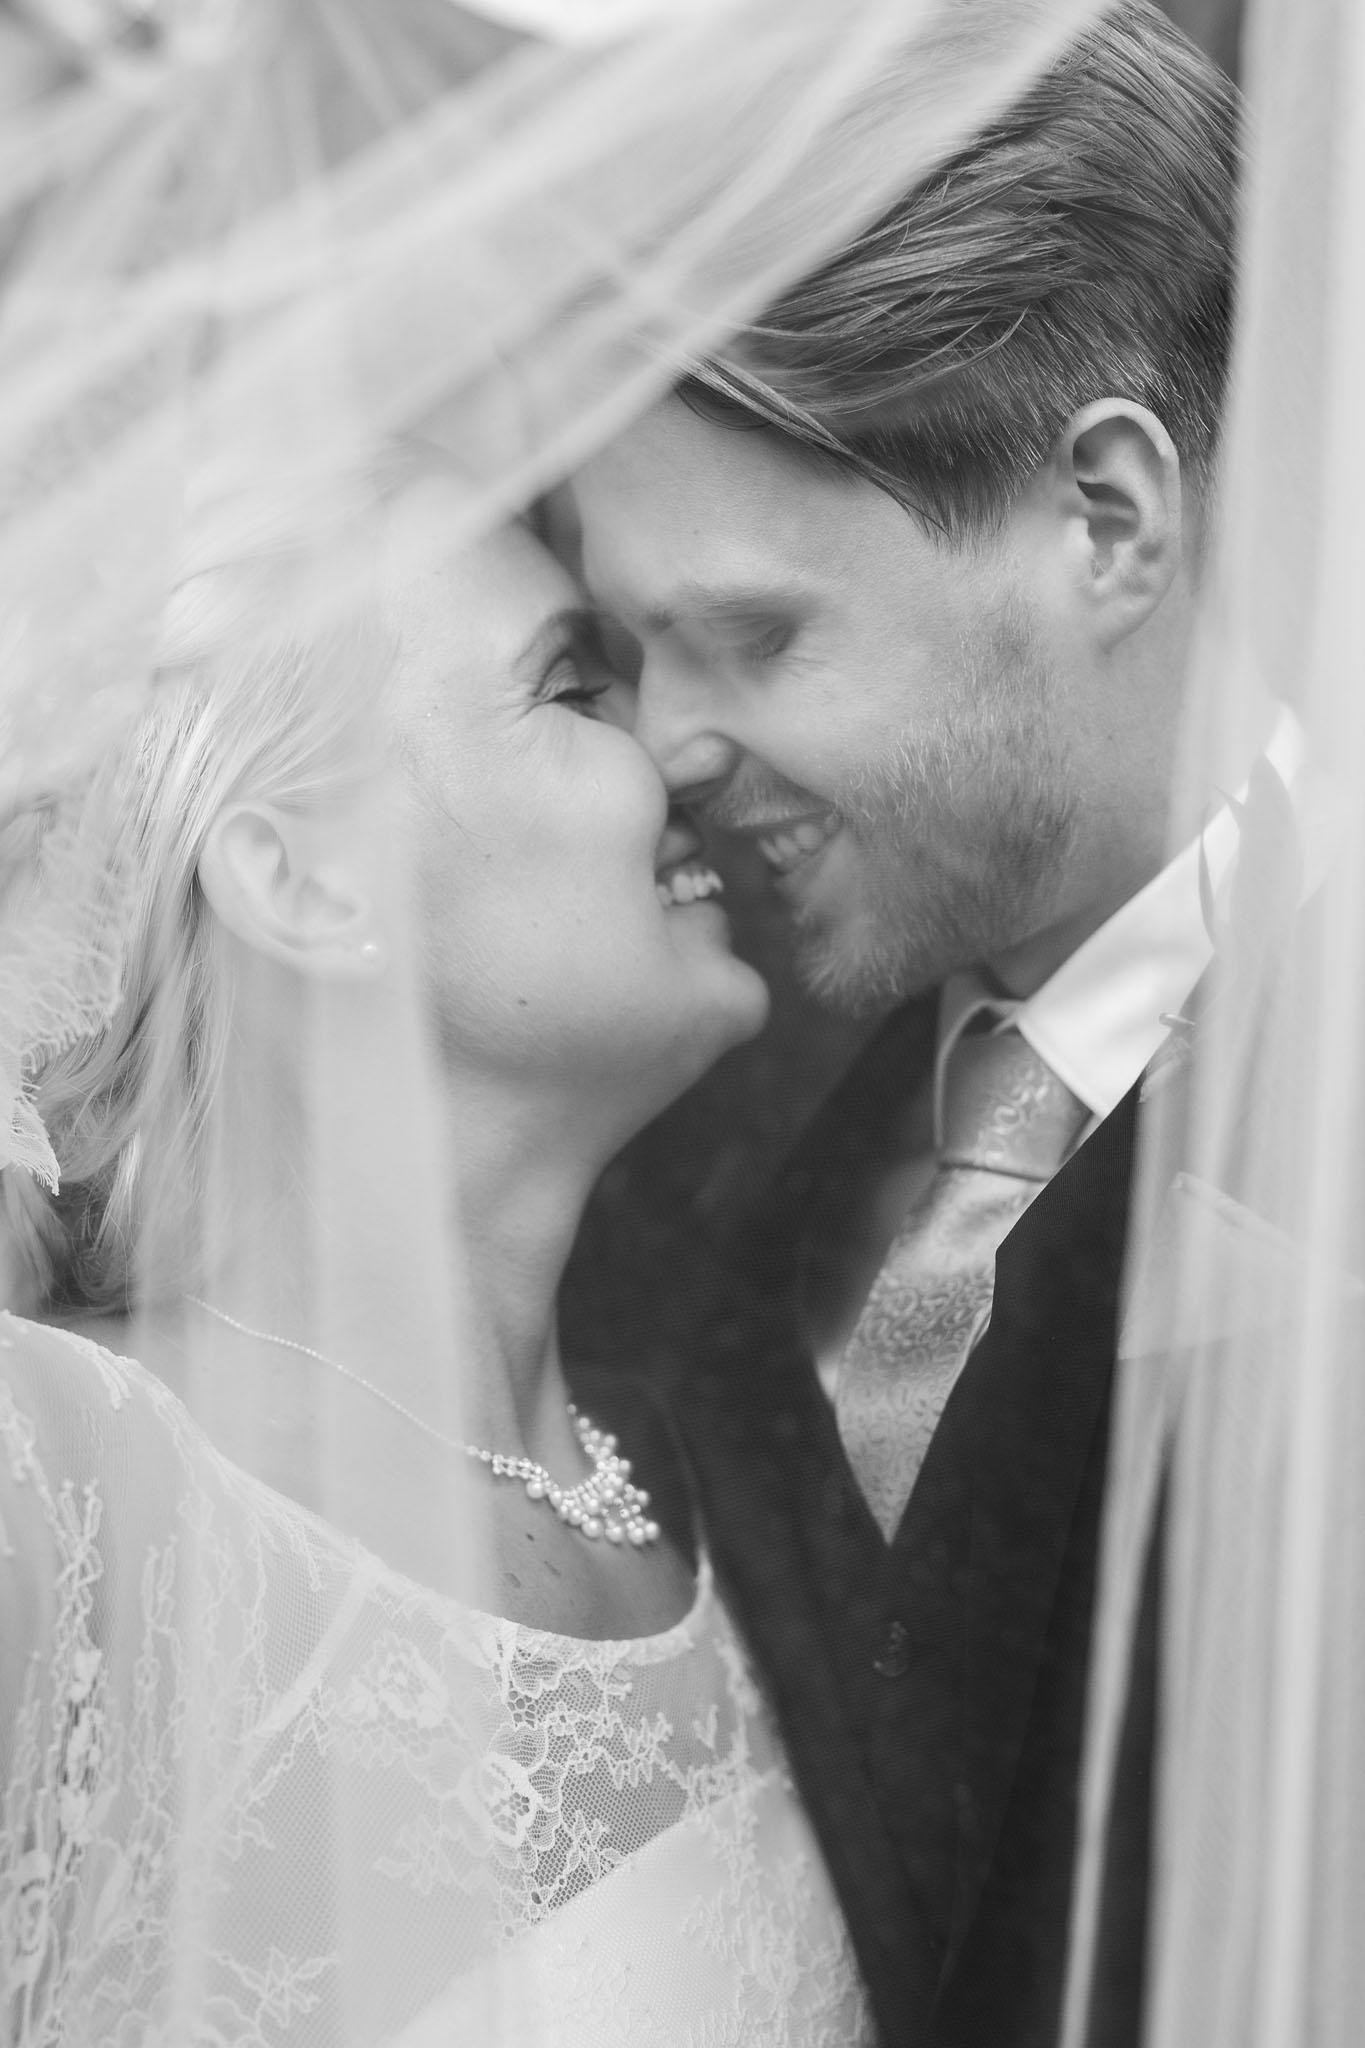 fotograf sabina wixner hudiksvall bröllop 20.jpg